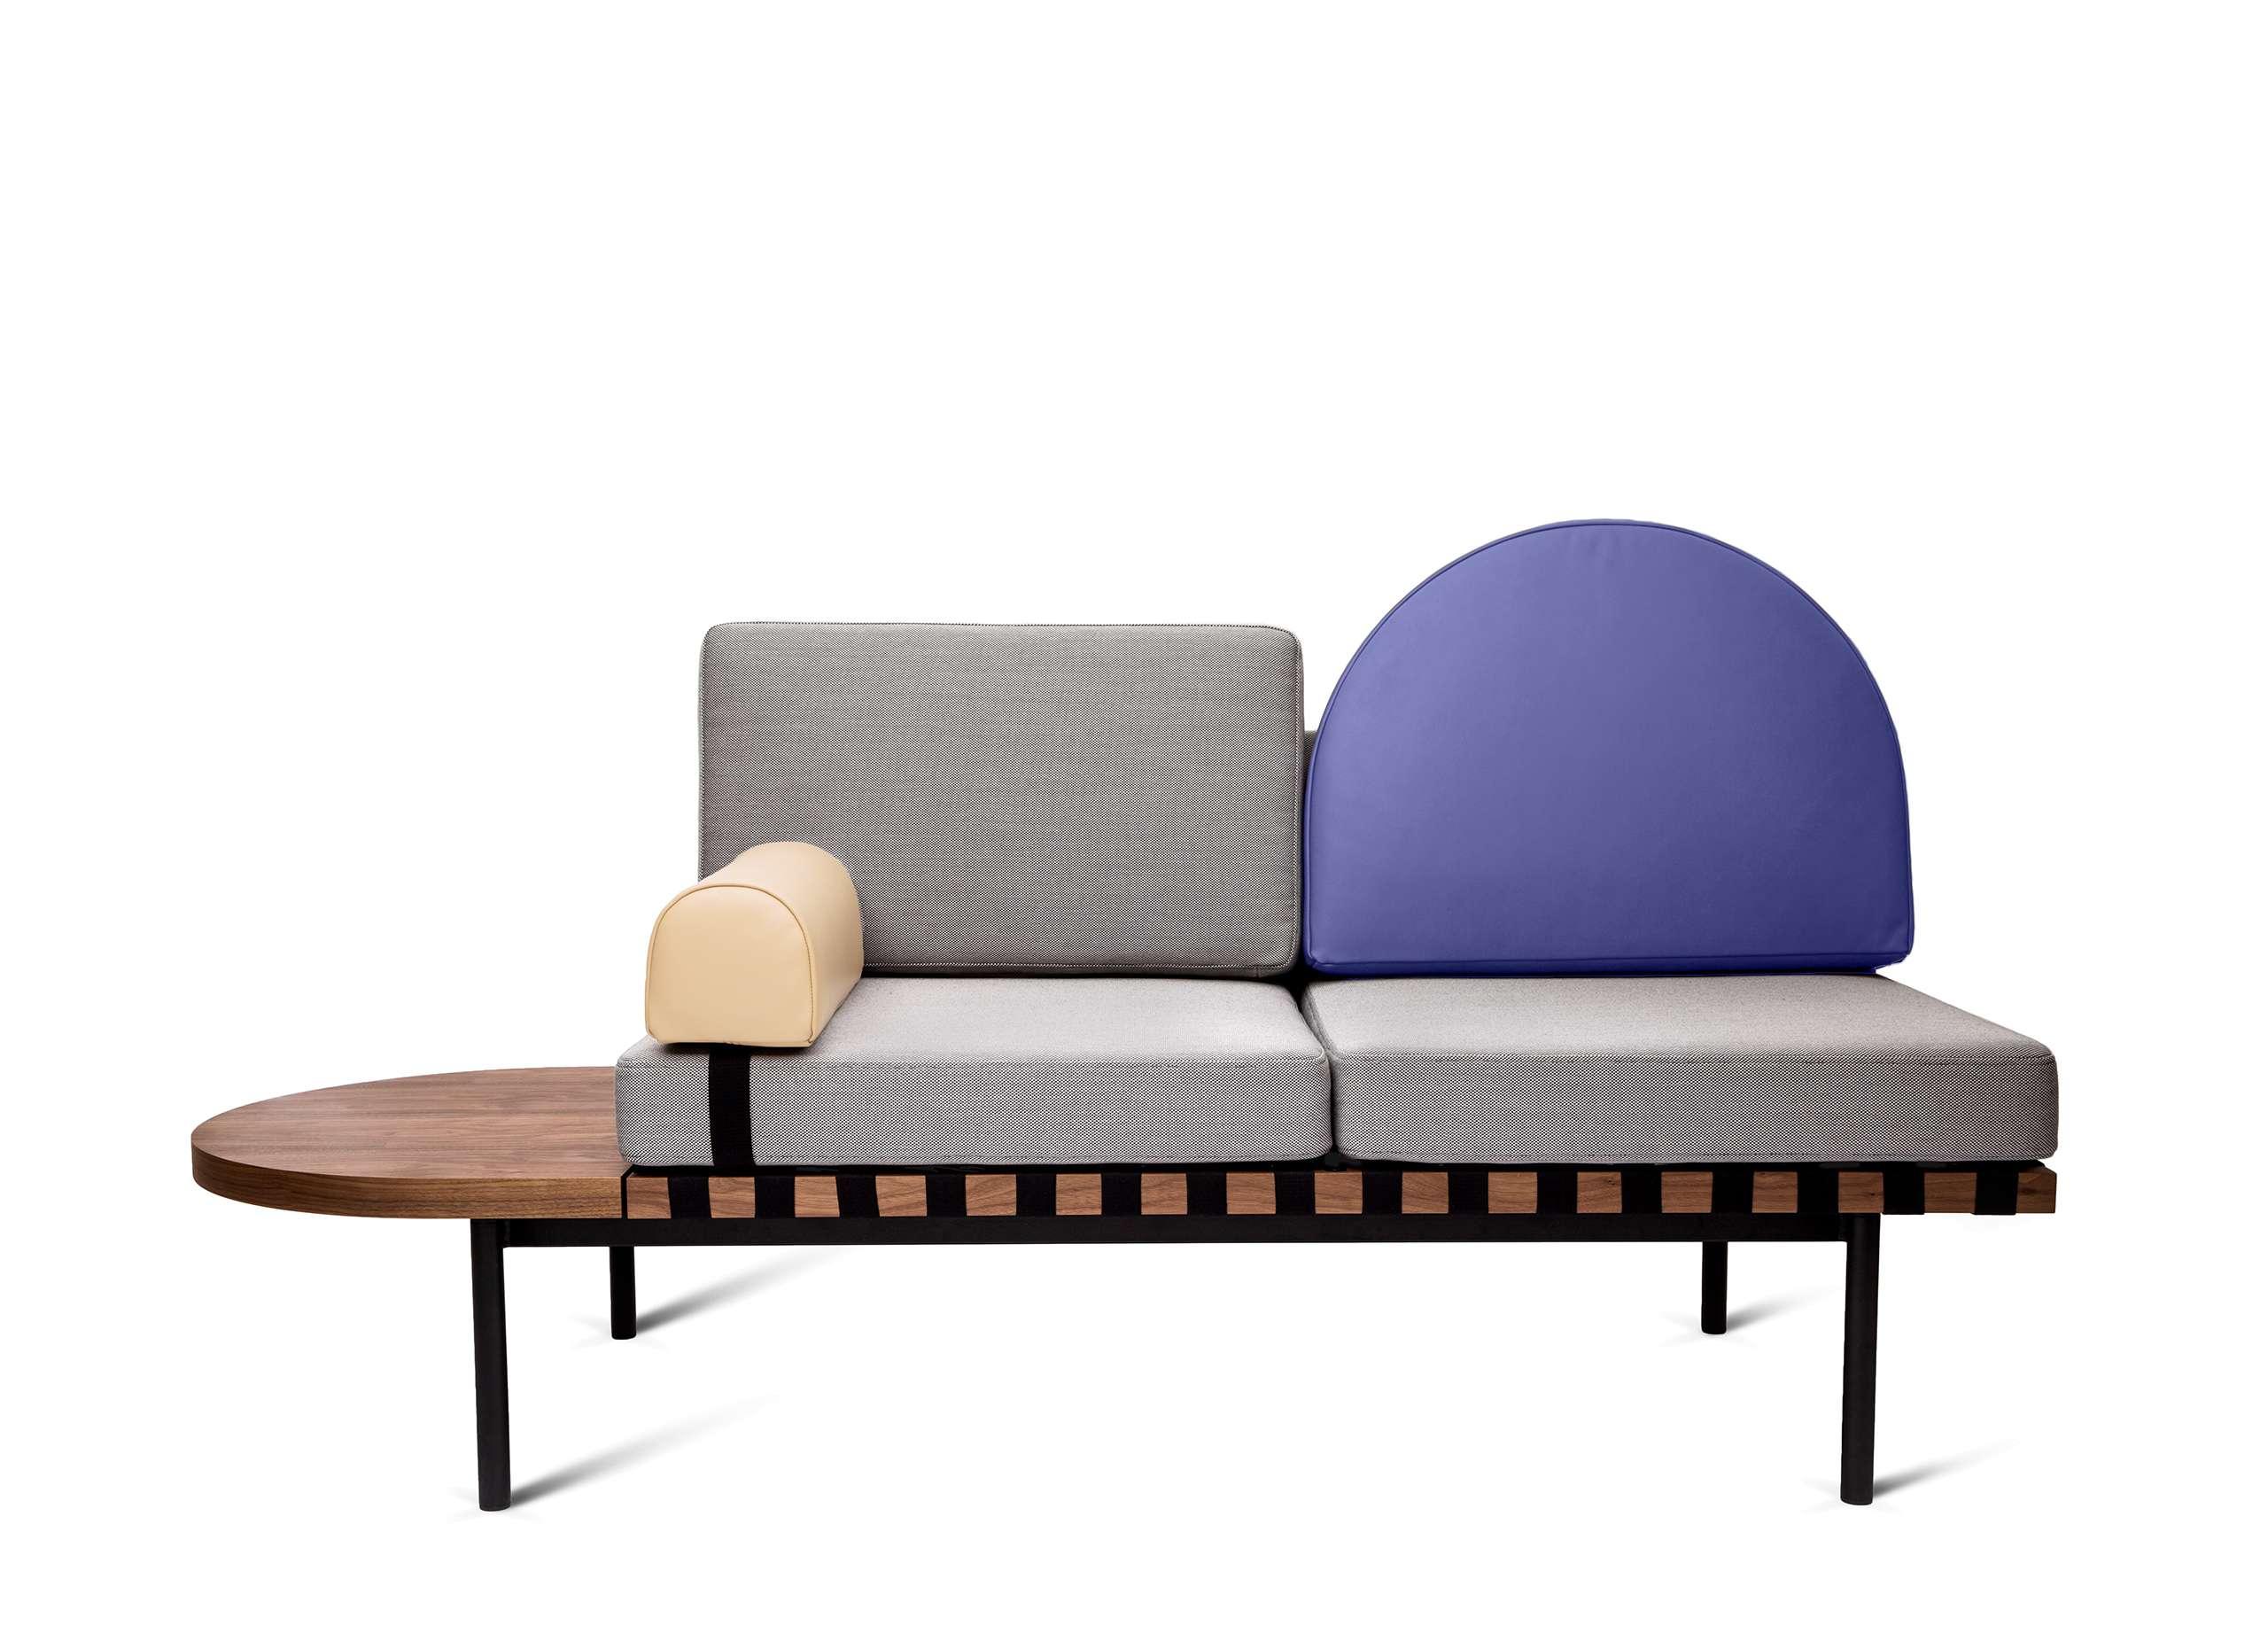 Sessel und Sofas | Designersessel | The Qvest Shop